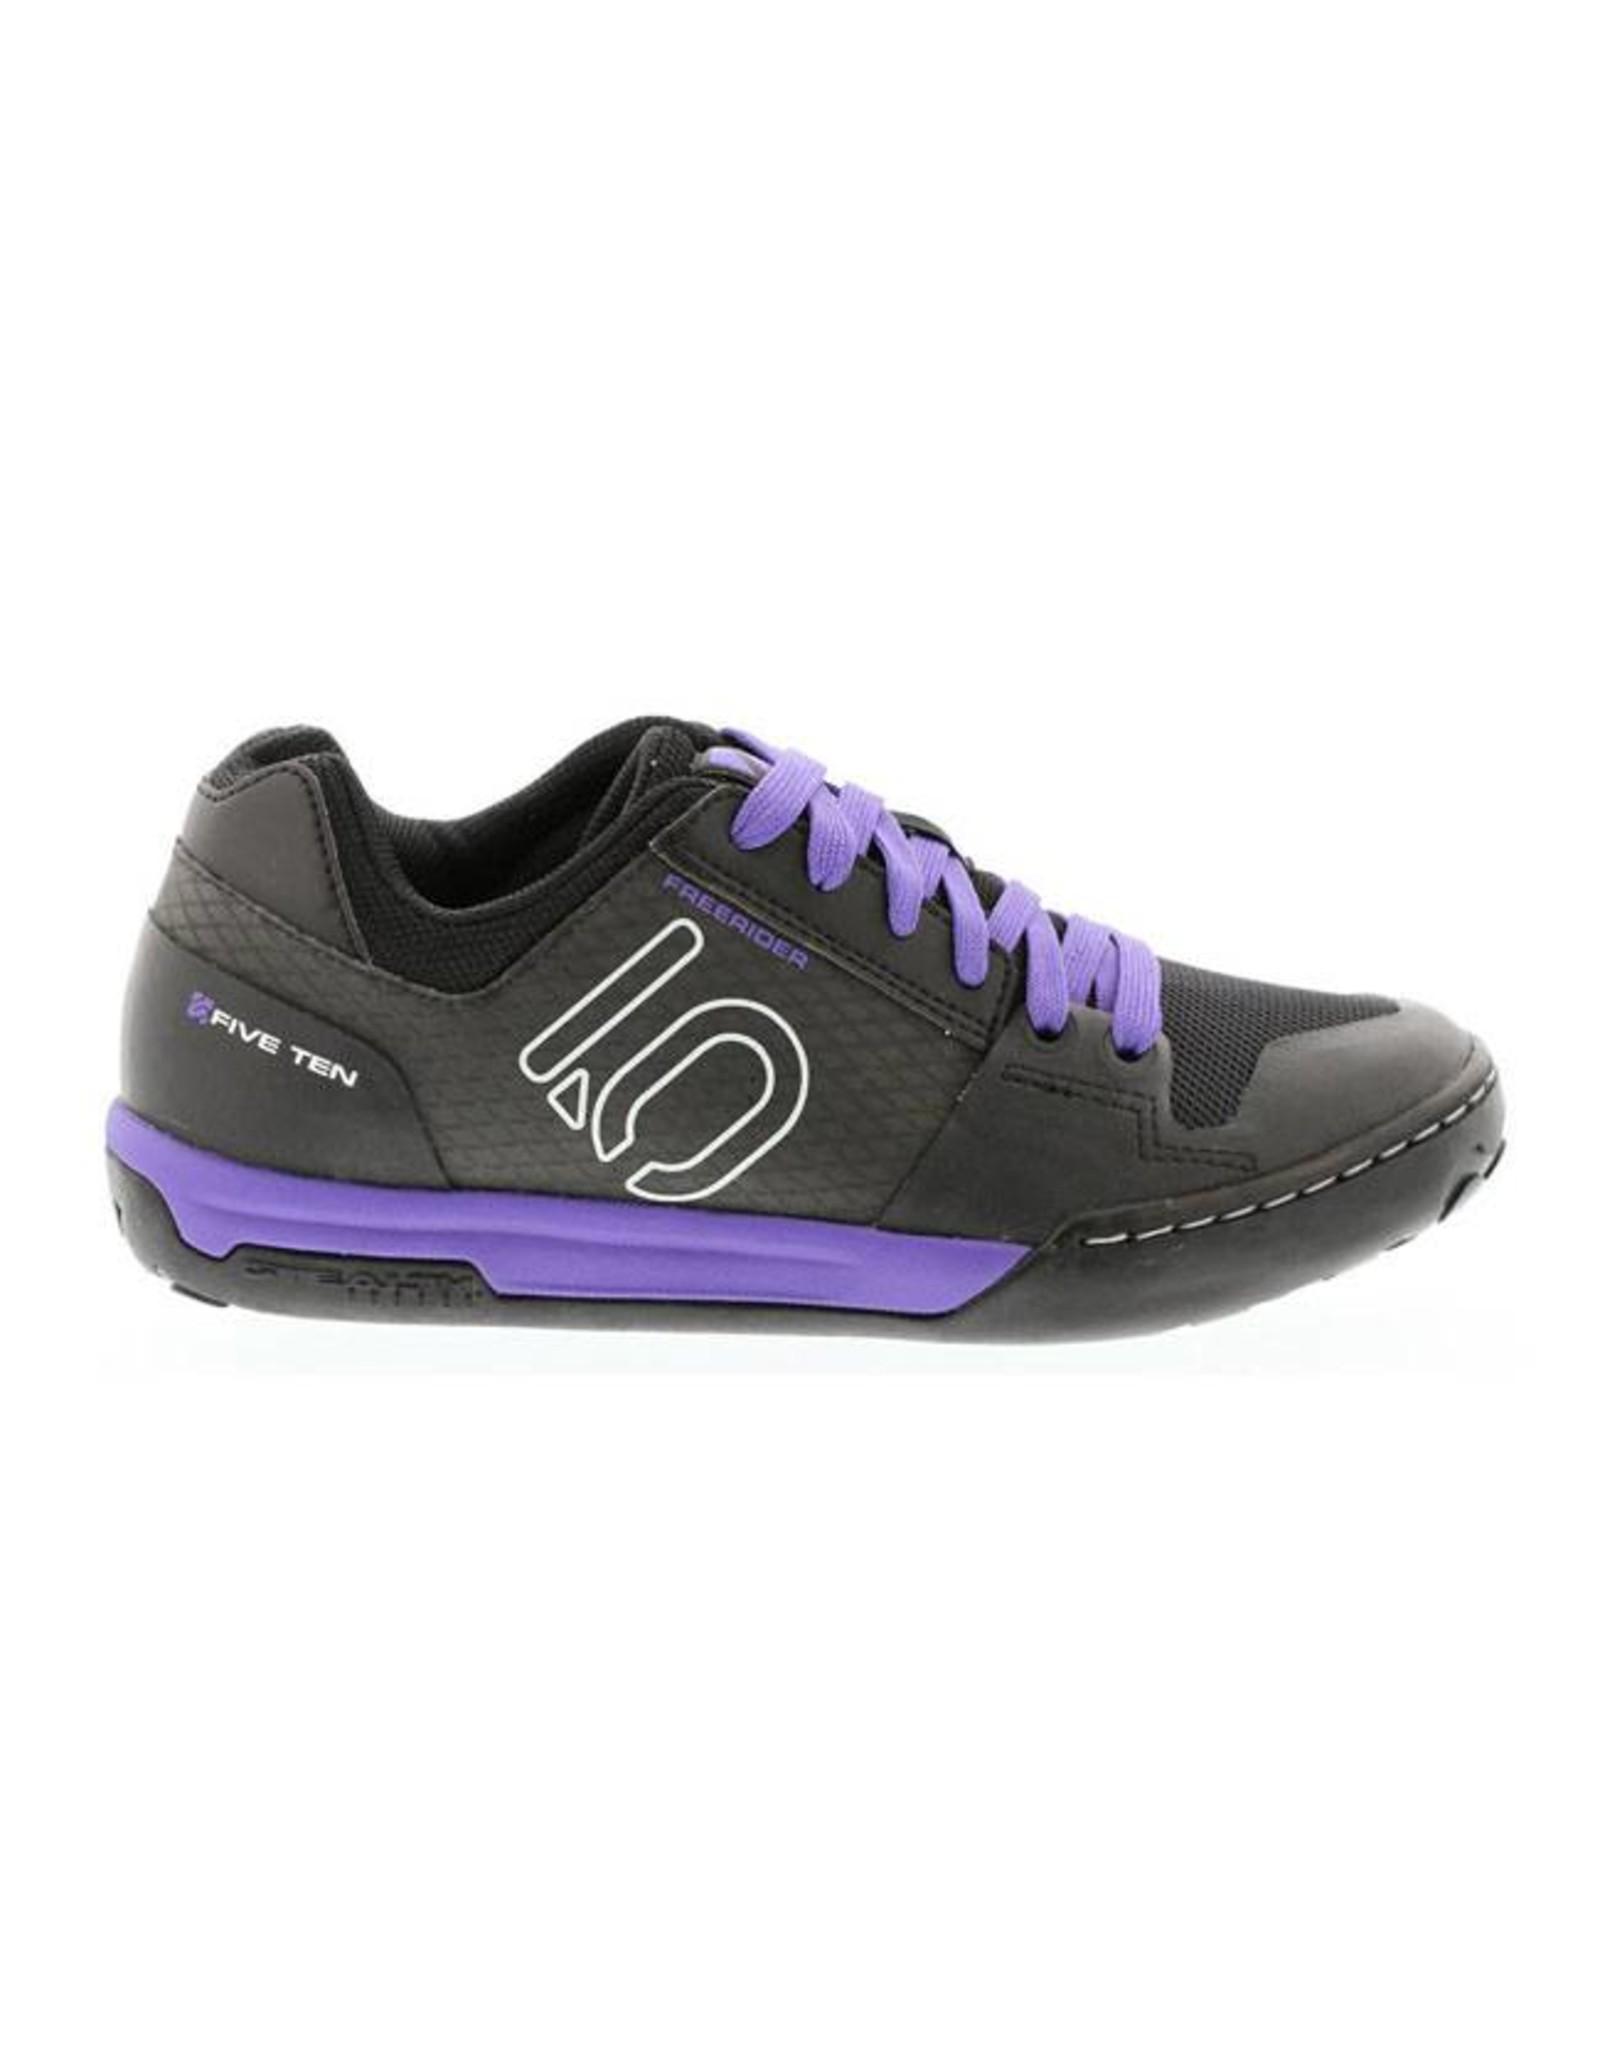 Five Ten Five Ten Freerider Contact Women's Flat Pedal Shoe: Split Purple 8.5